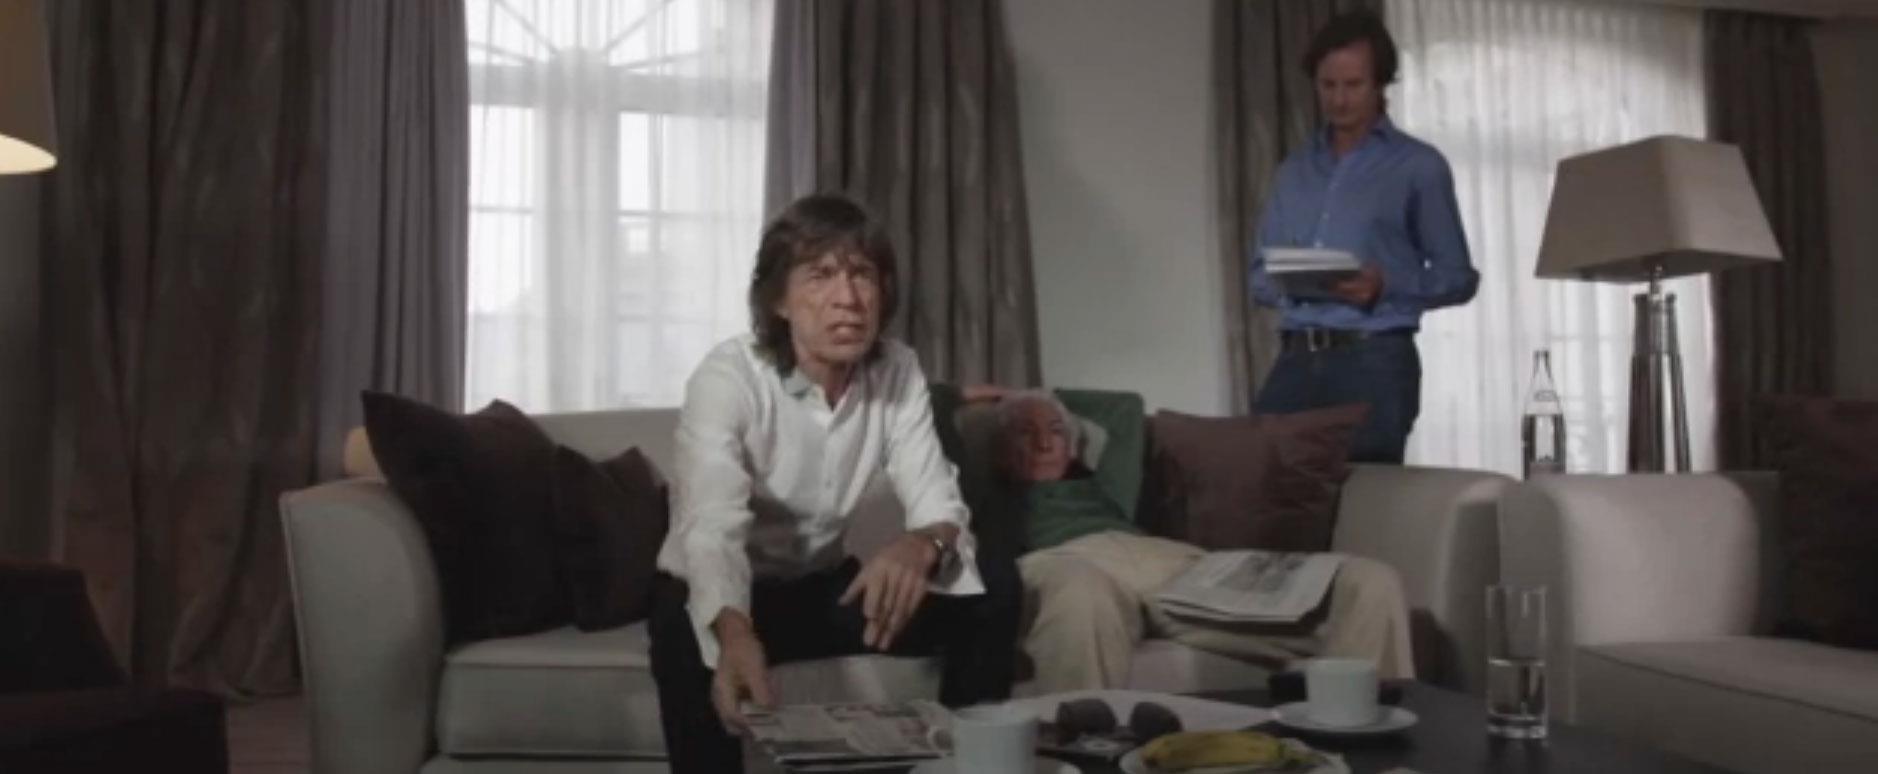 Mick Jagger nello spot per i Monty Python